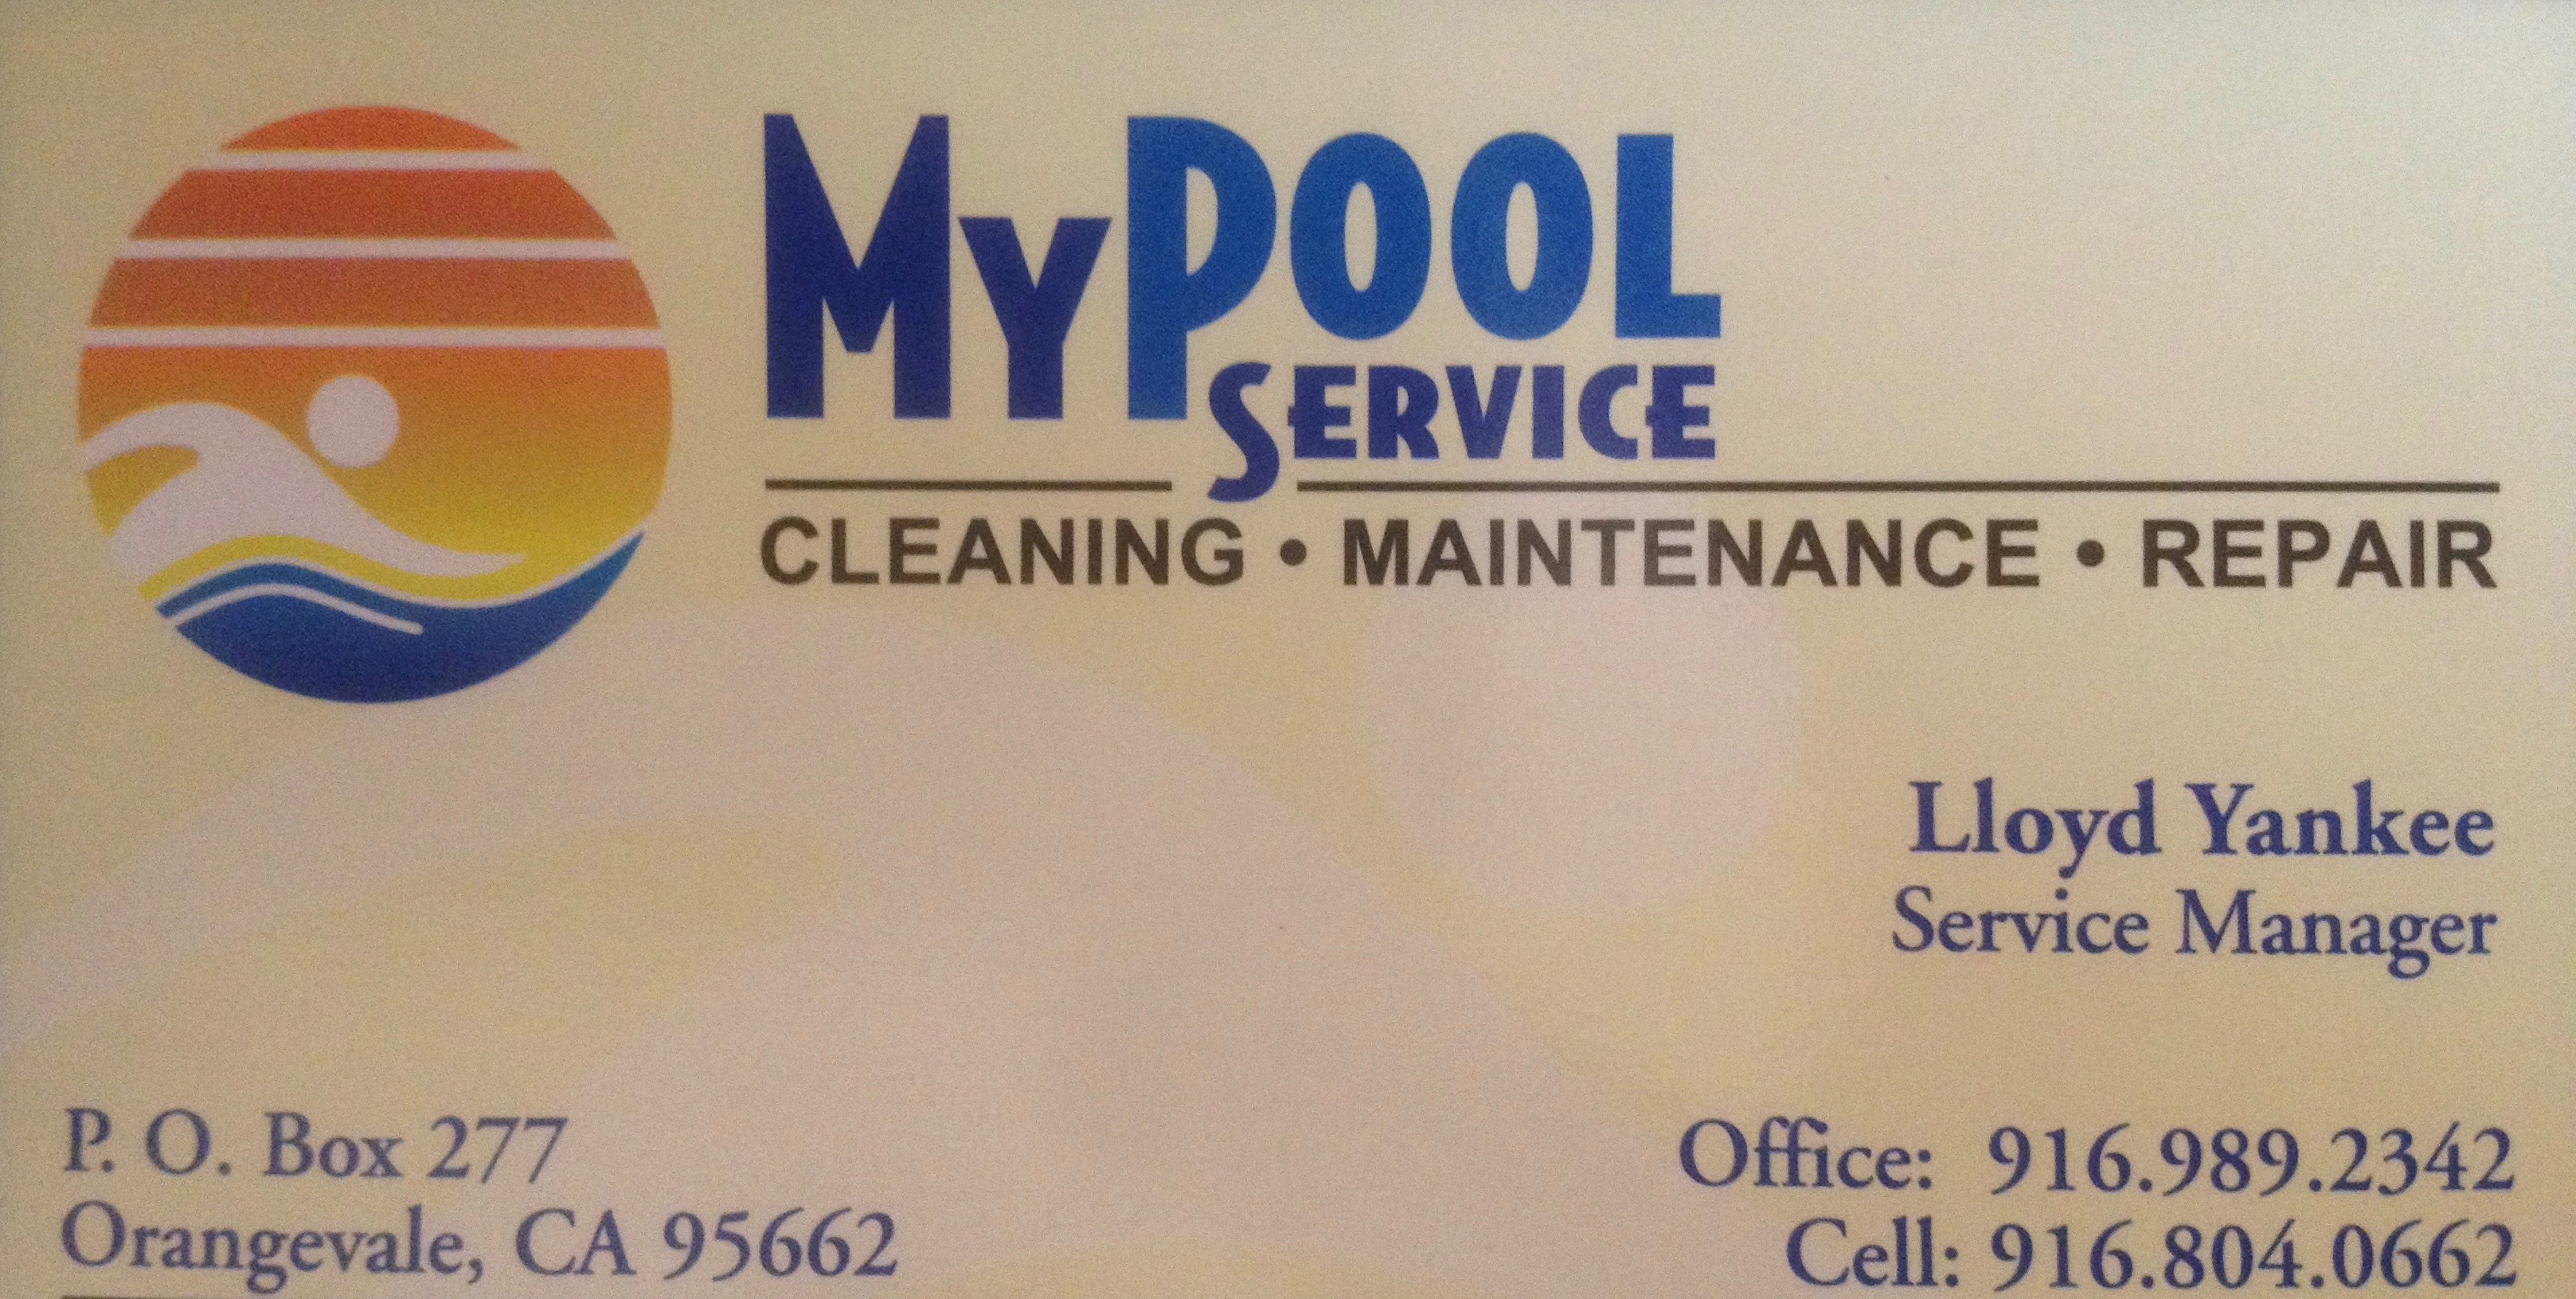 My Pool Service image 1